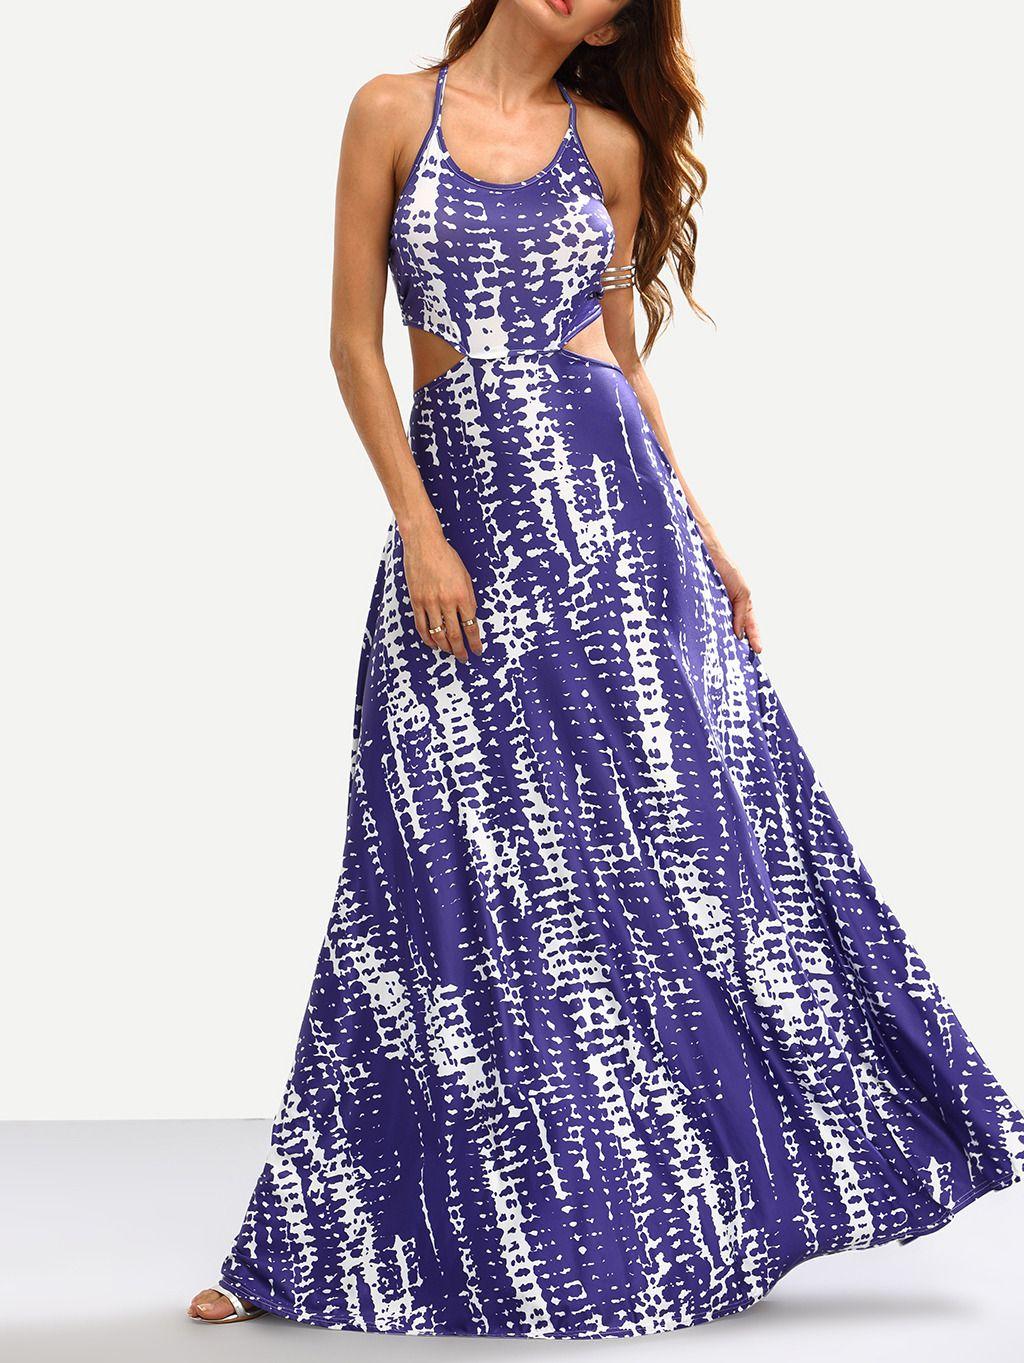 Cómpralo ya!. Blue Tie Dye Print Cutout Maxi Dress. Blue Beach ...